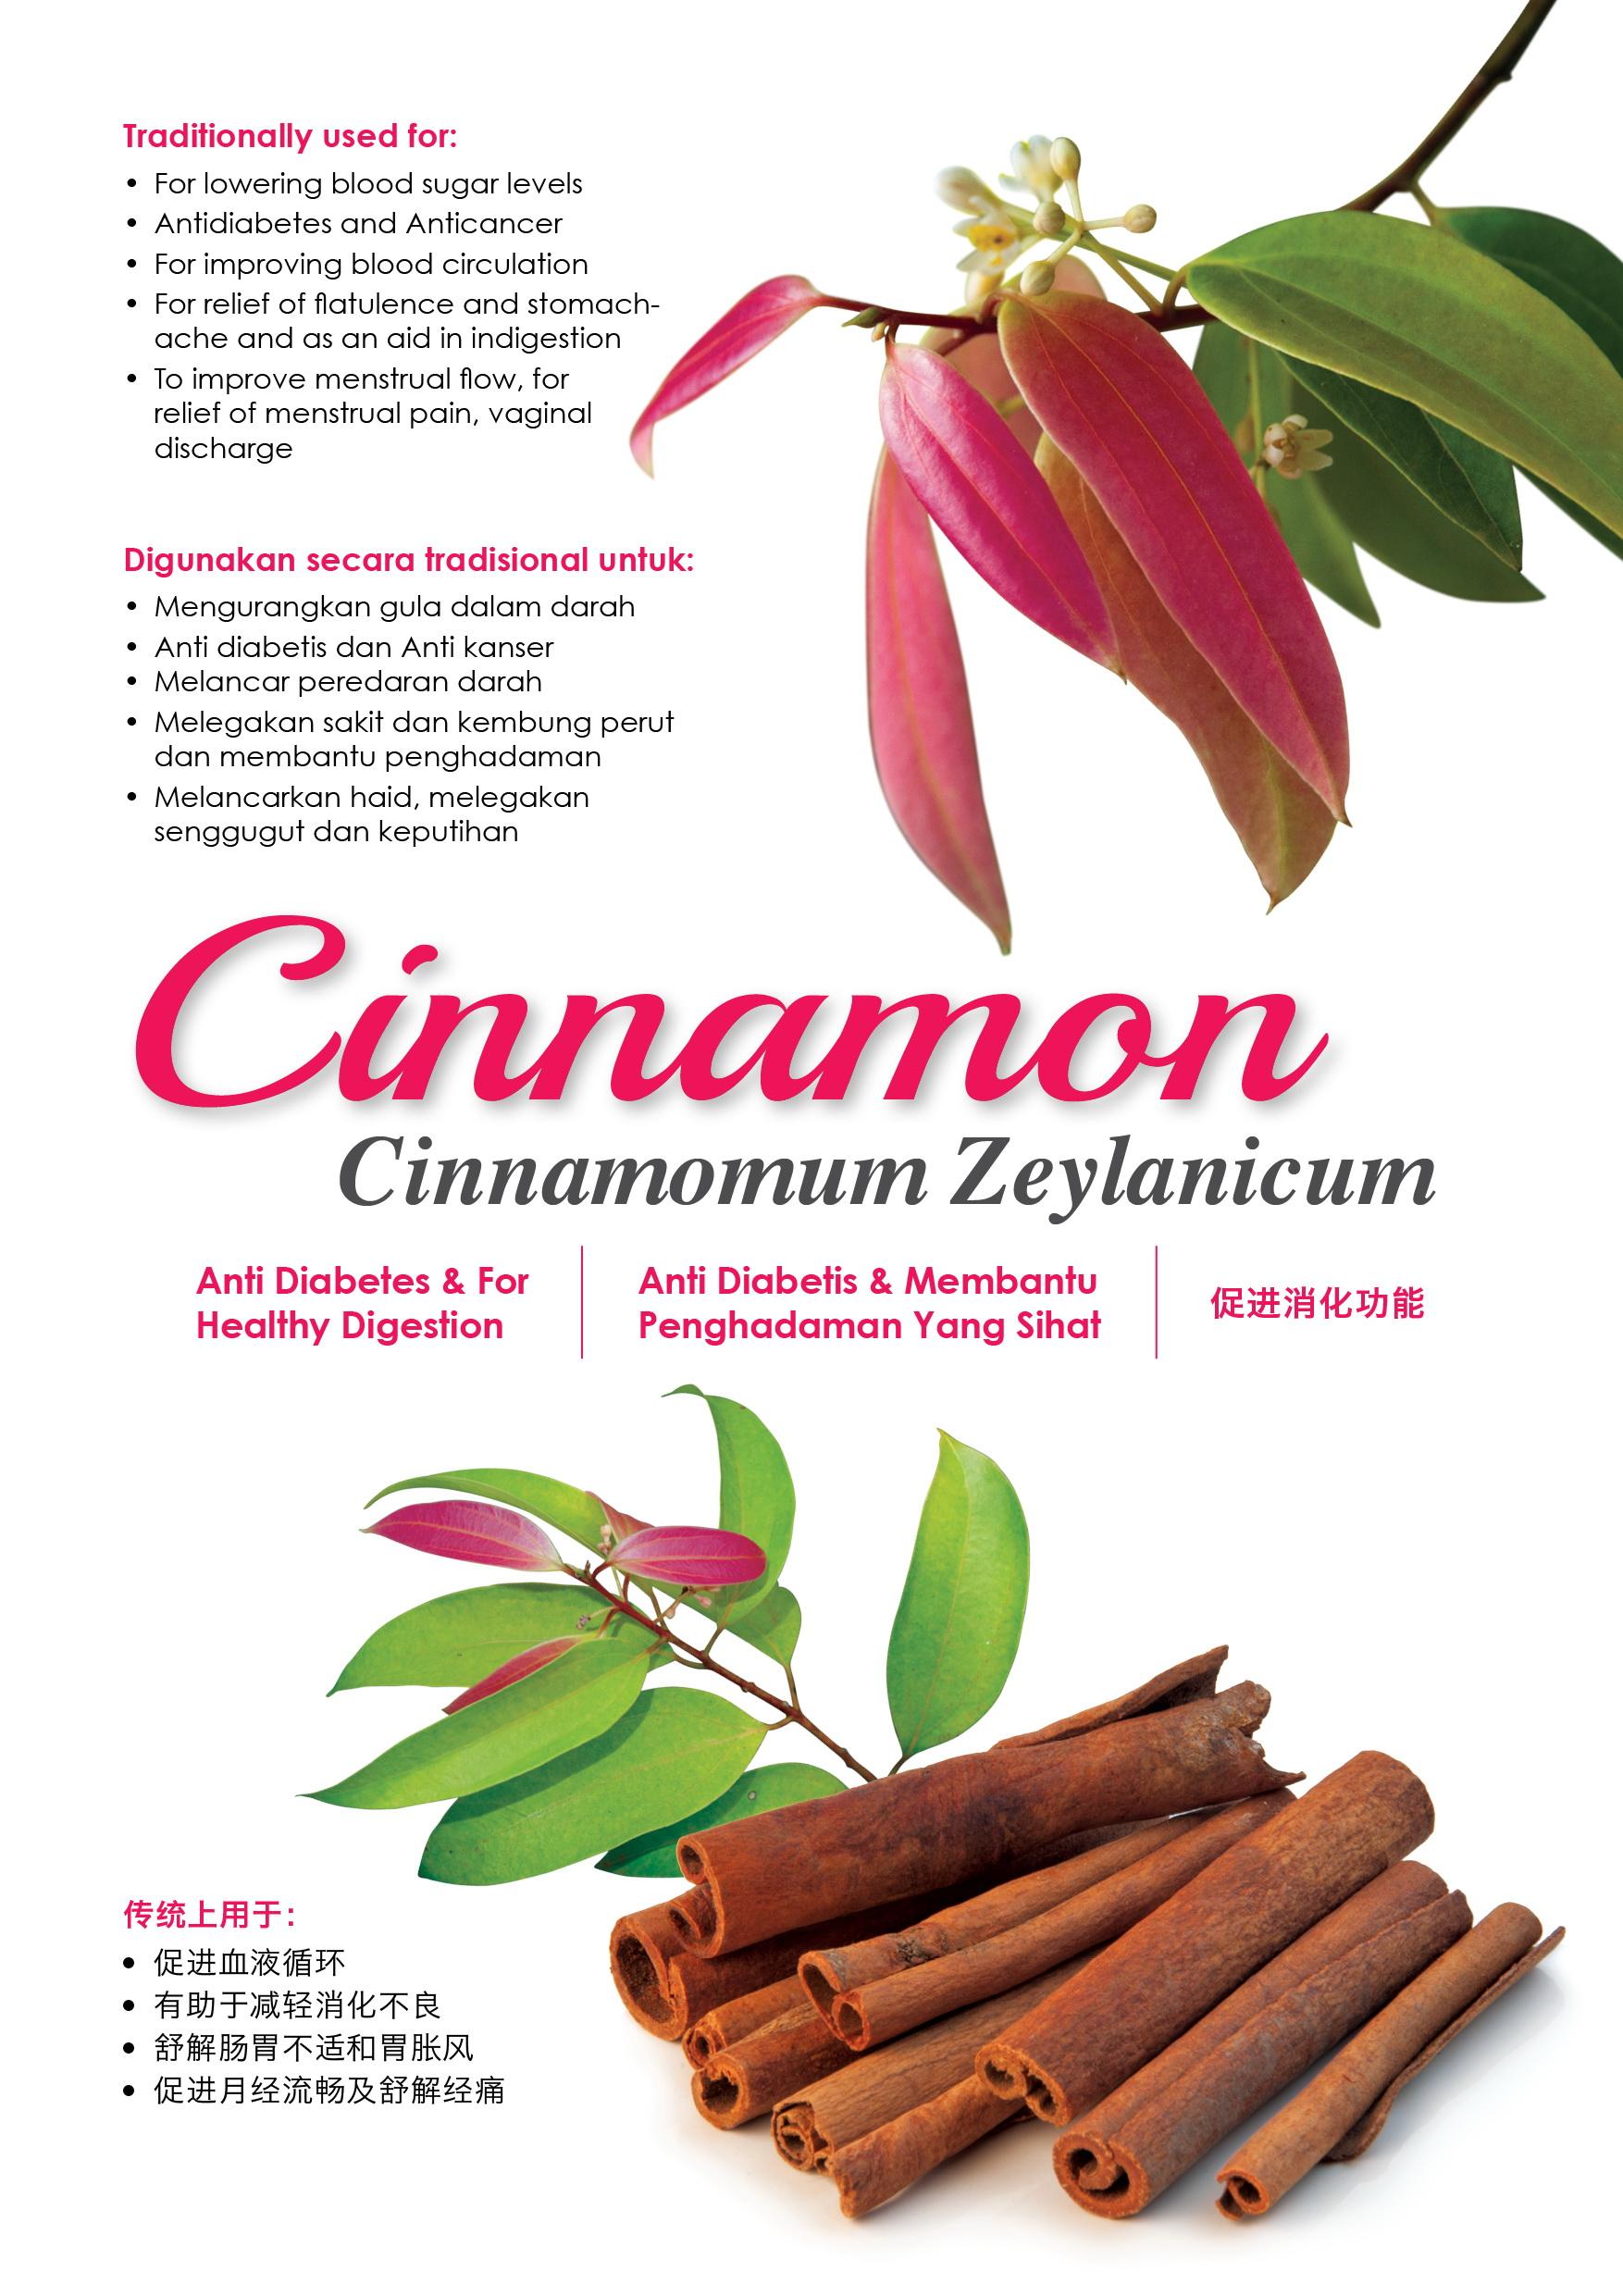 Poster_cinnamon_yoe1-ra.jpg?148421803375